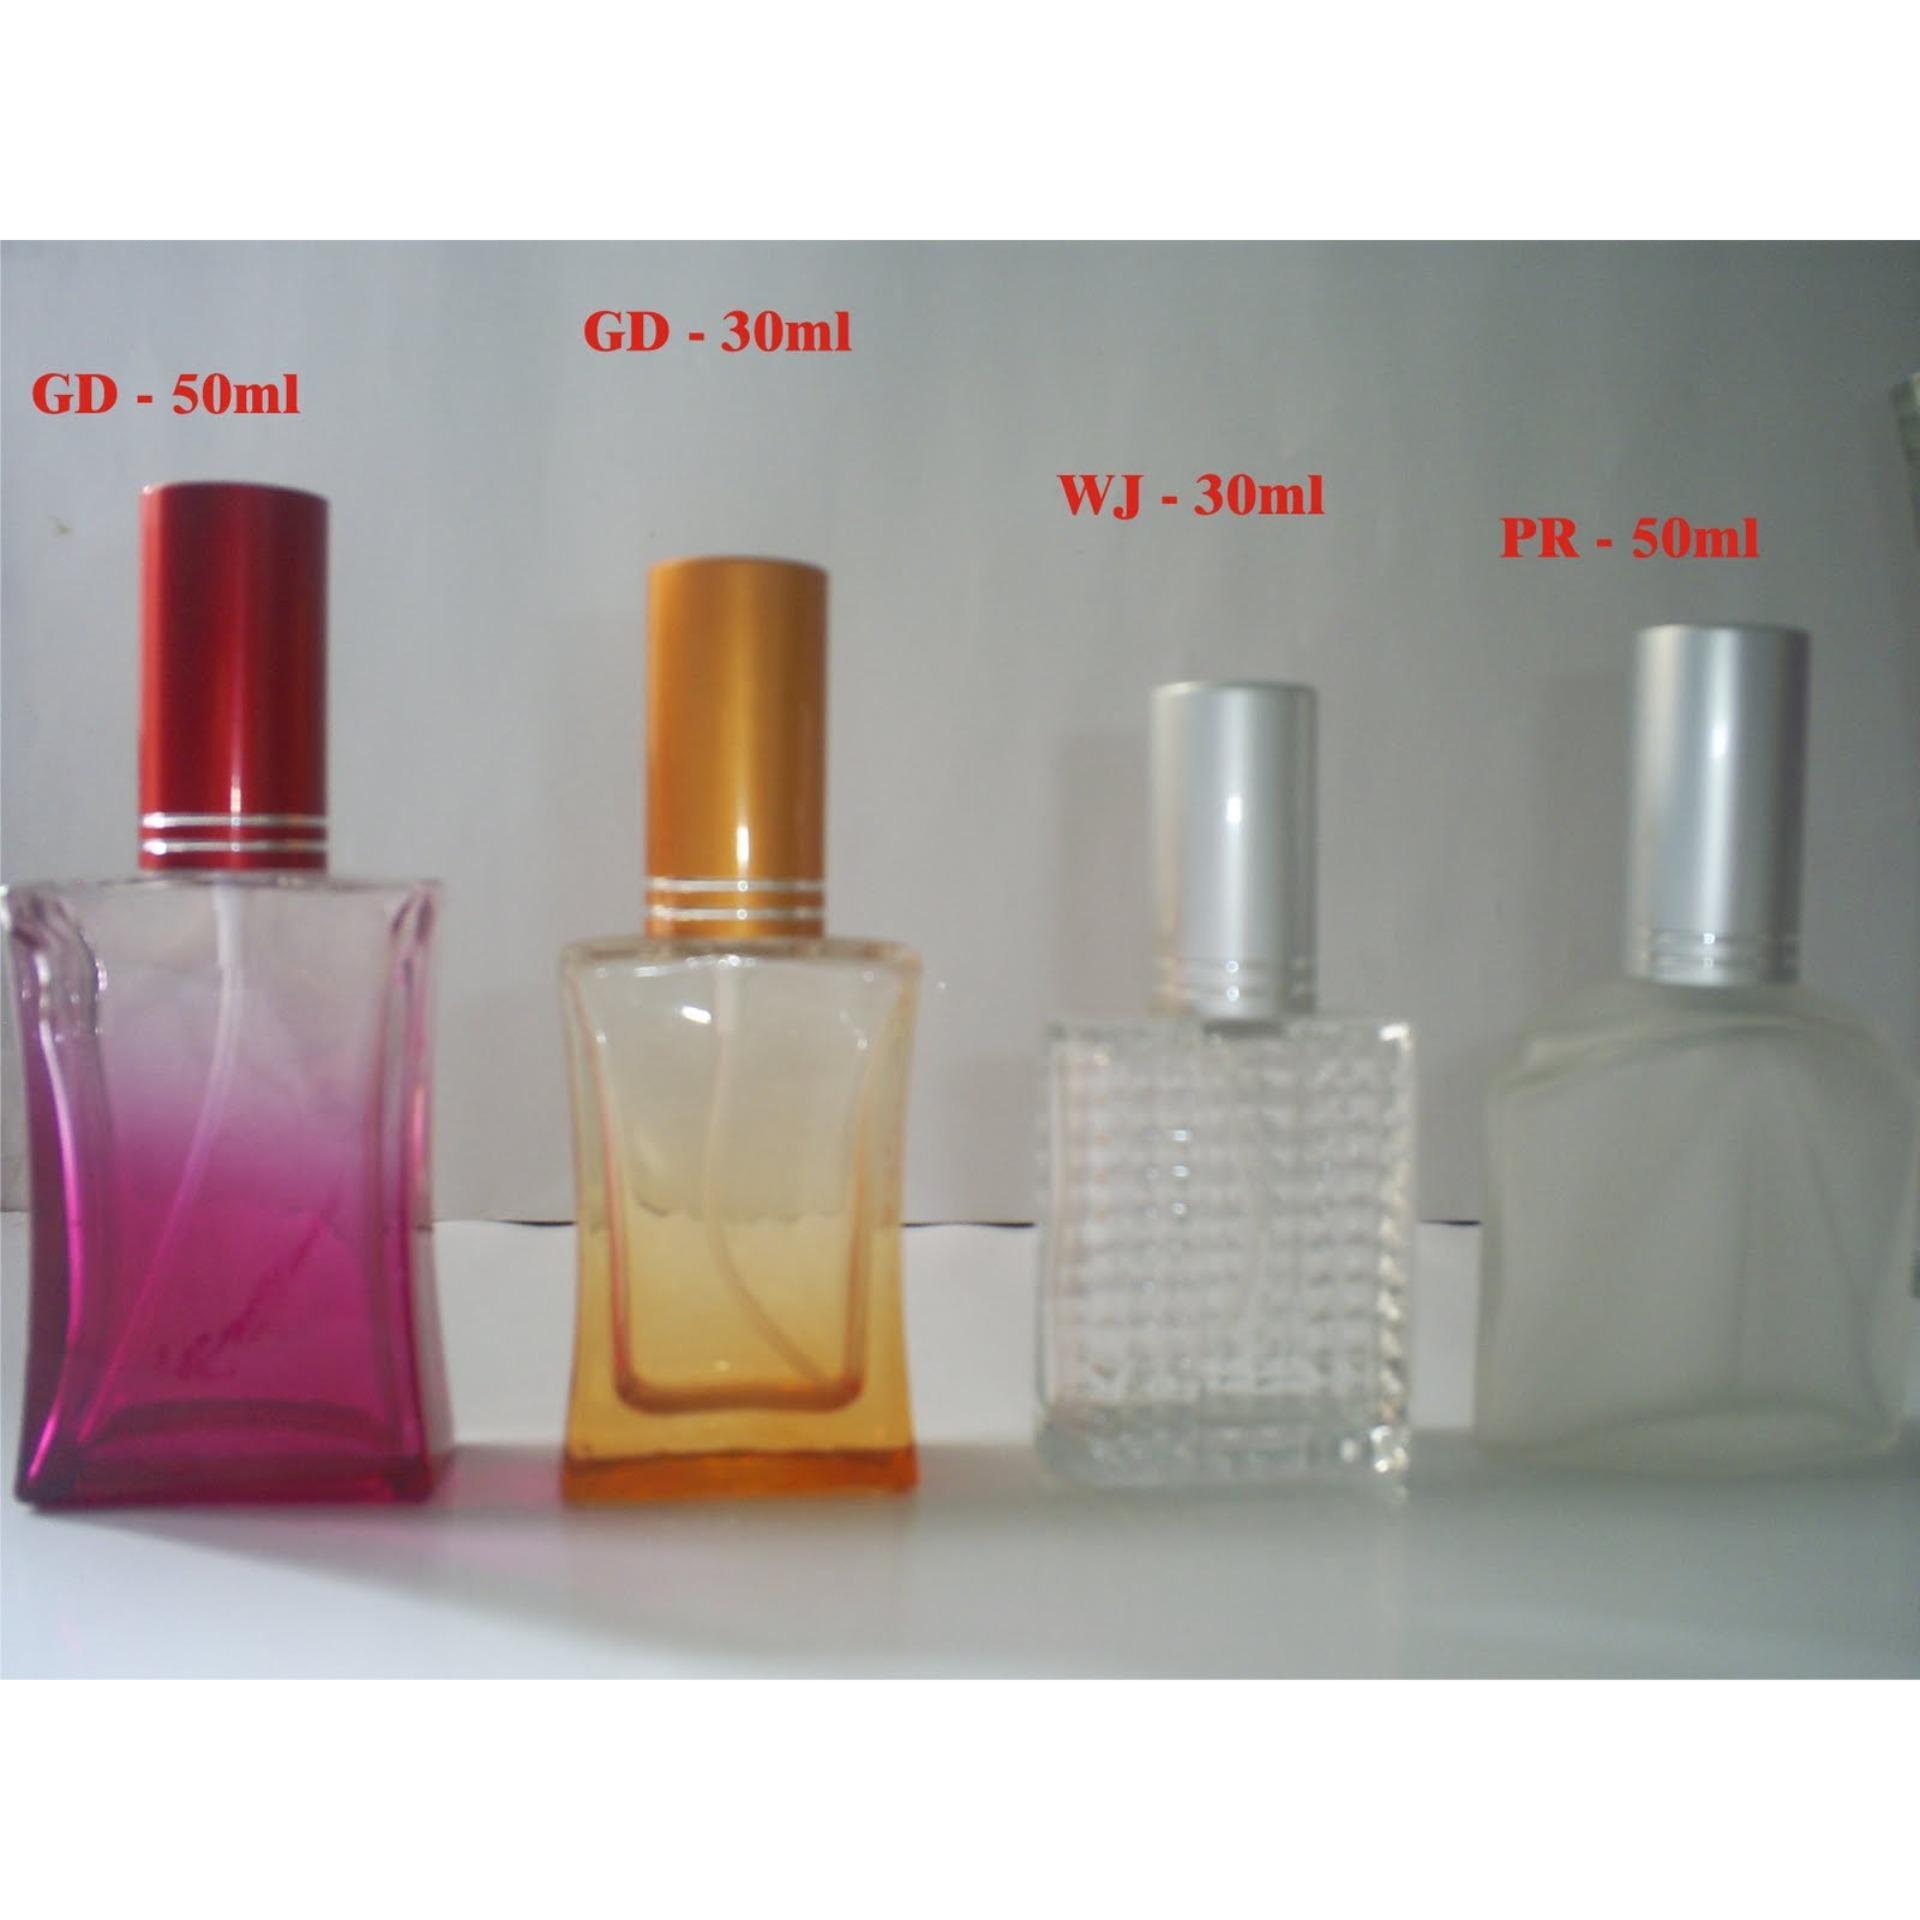 Jual Delice Botol Parfum Refill Mini Travel Isi Ulang Atomizer Refillable Spray Minyak Wangi Non Alkohol Bottle 30 Ml